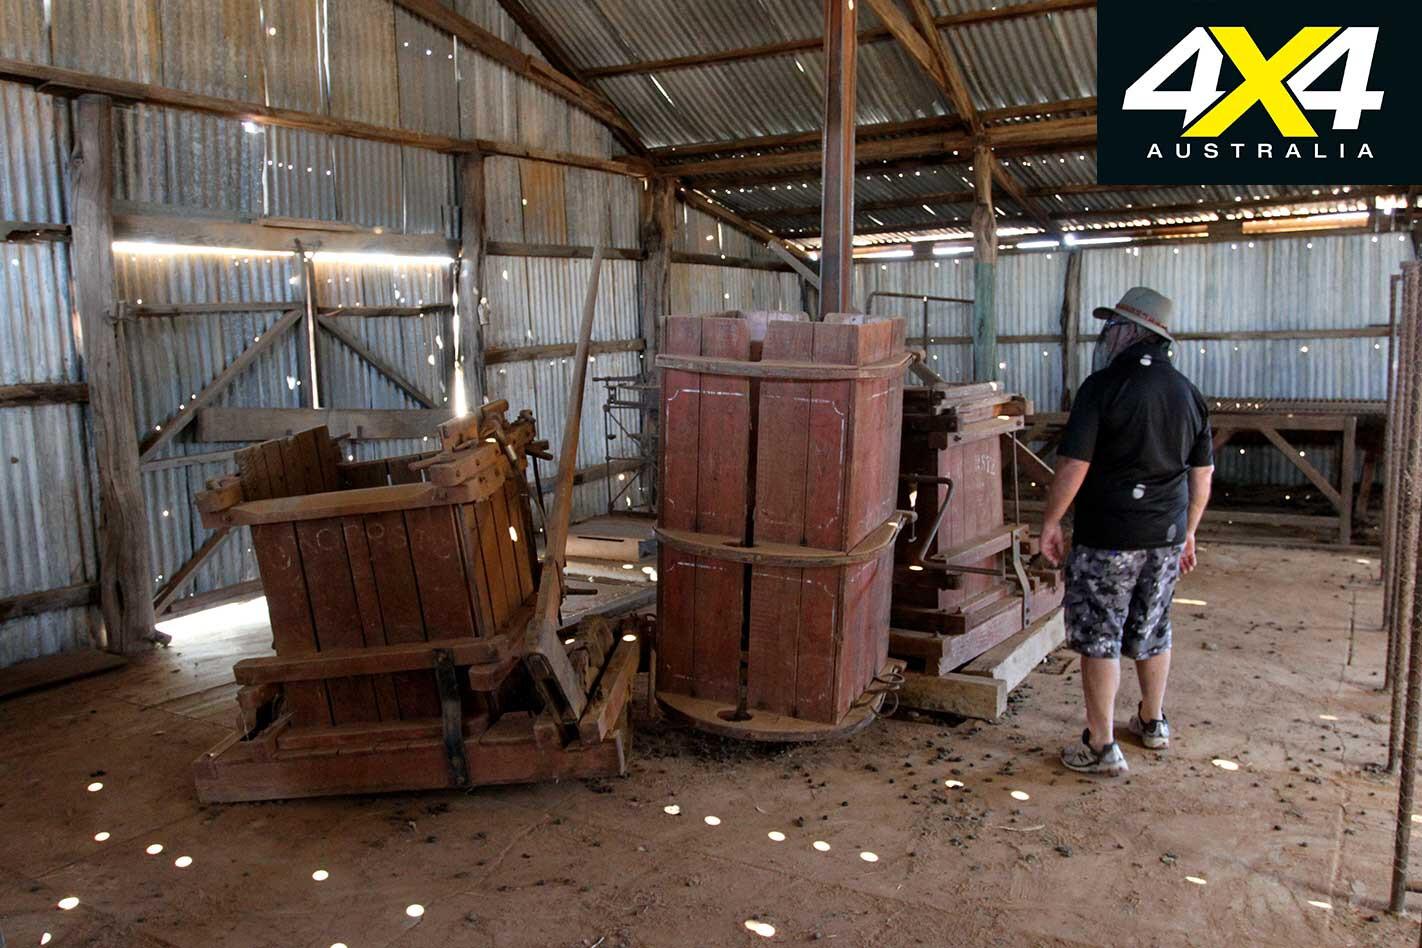 4 X 4 Trip Through The Tibooburra Gorge Loop Drive NSW Shearing Shed Jpg